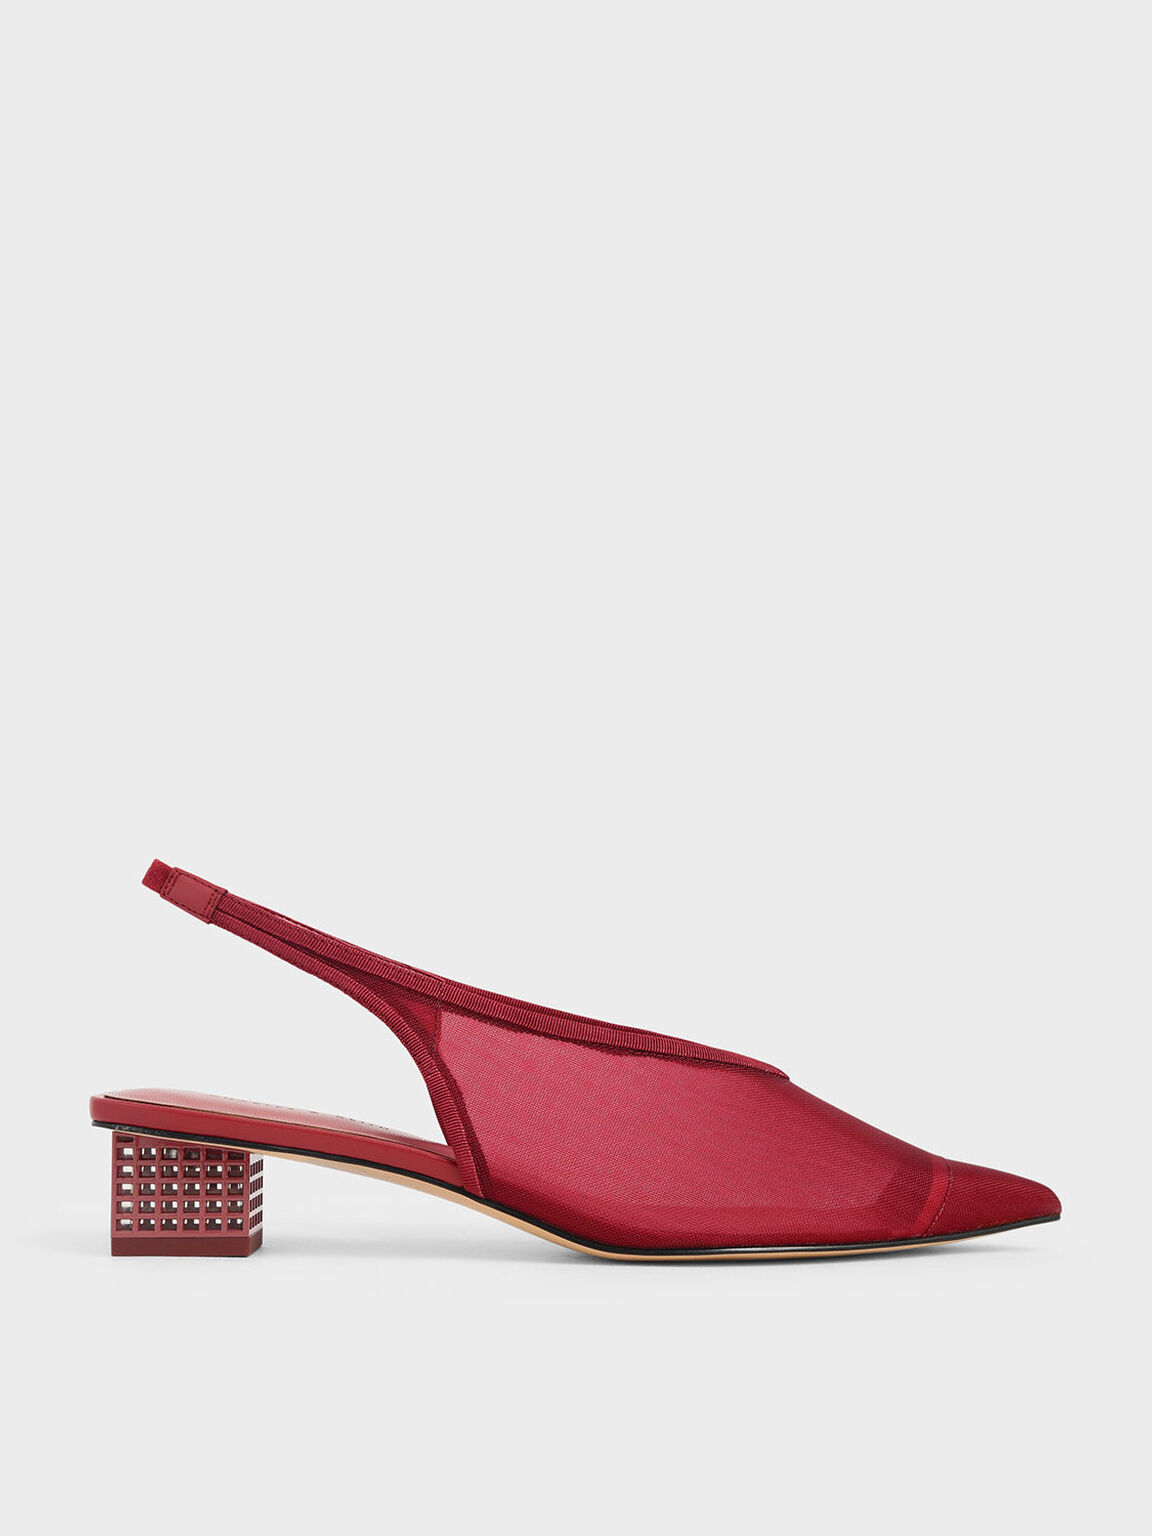 網紗尖頭粗跟鞋, 紅色, hi-res